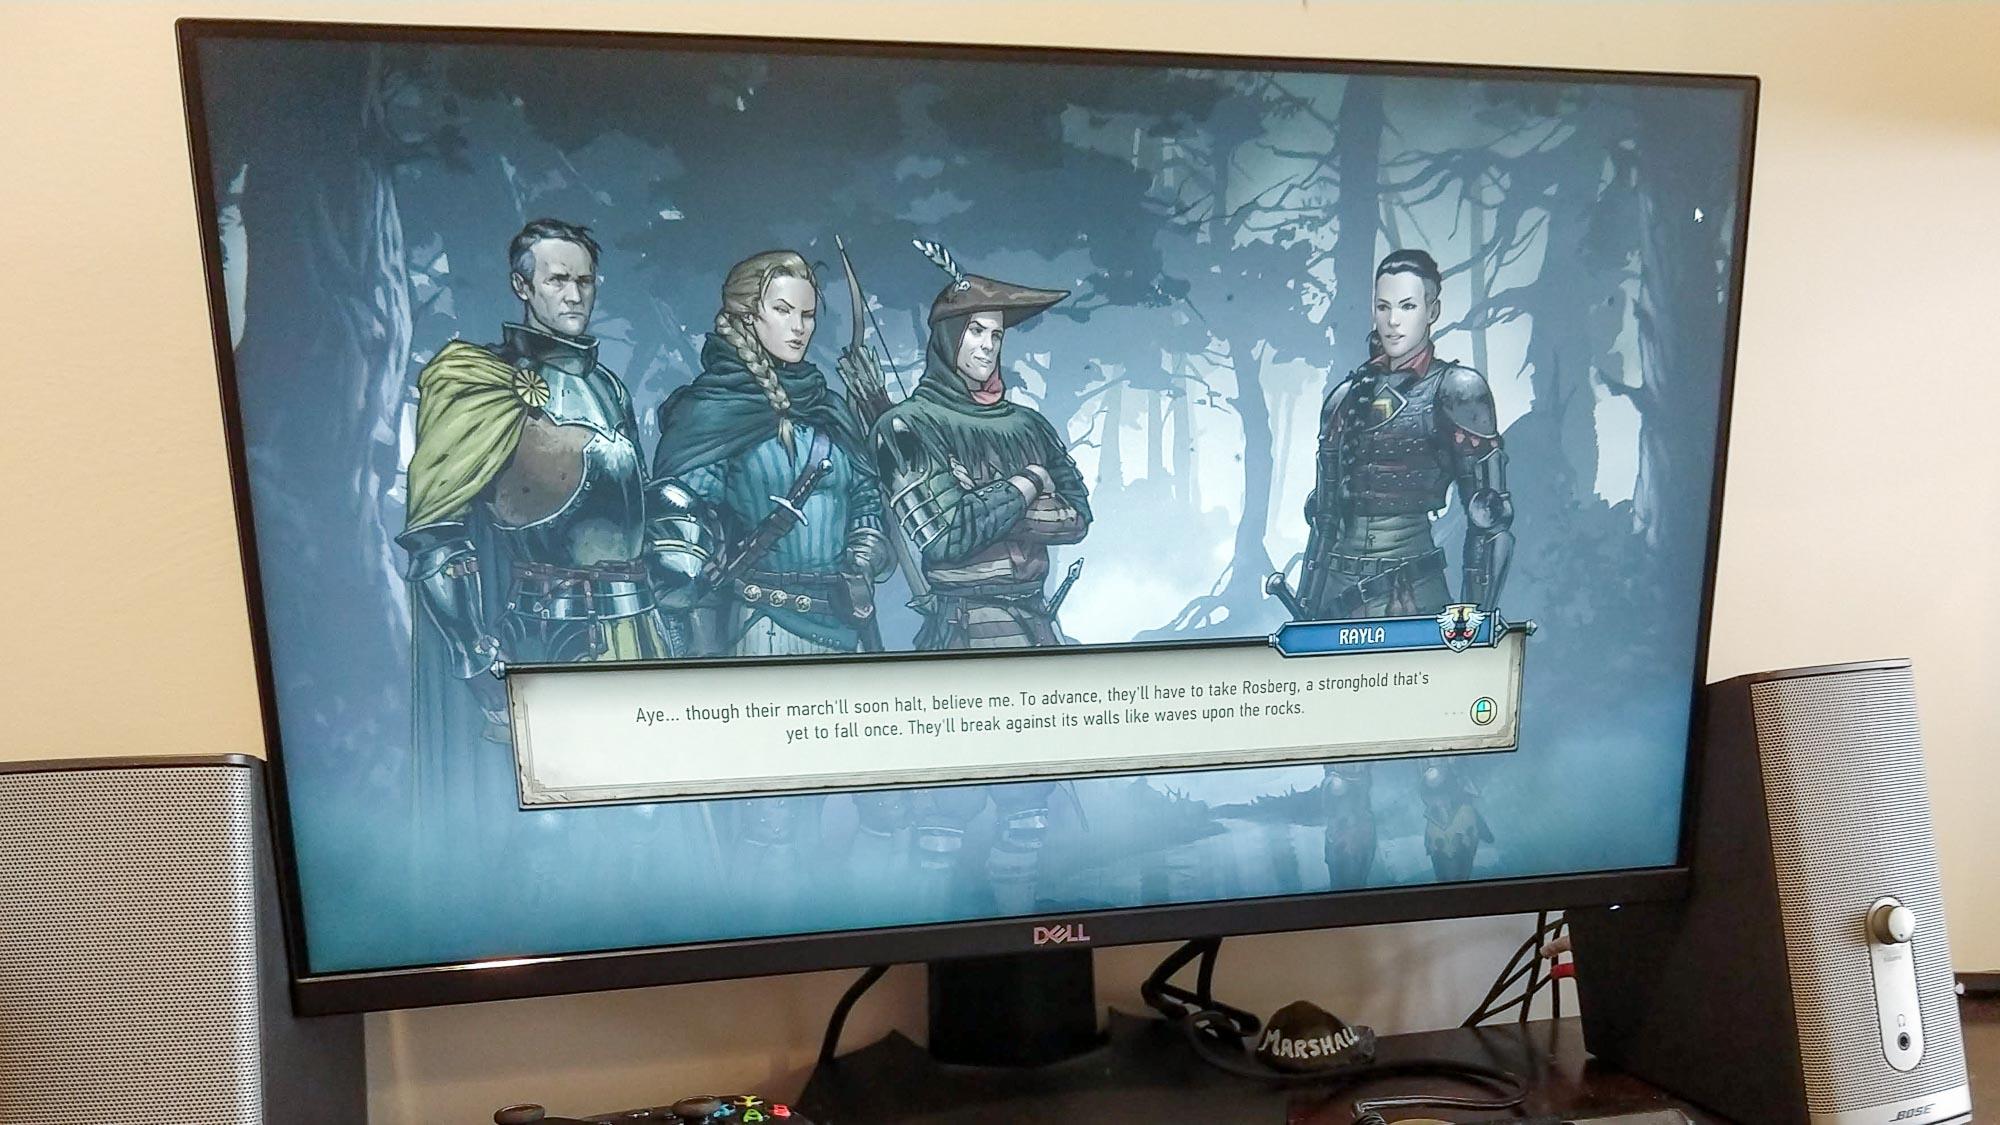 Best gaming monitors: Dell 24 Gaming Monitor S2421HGF